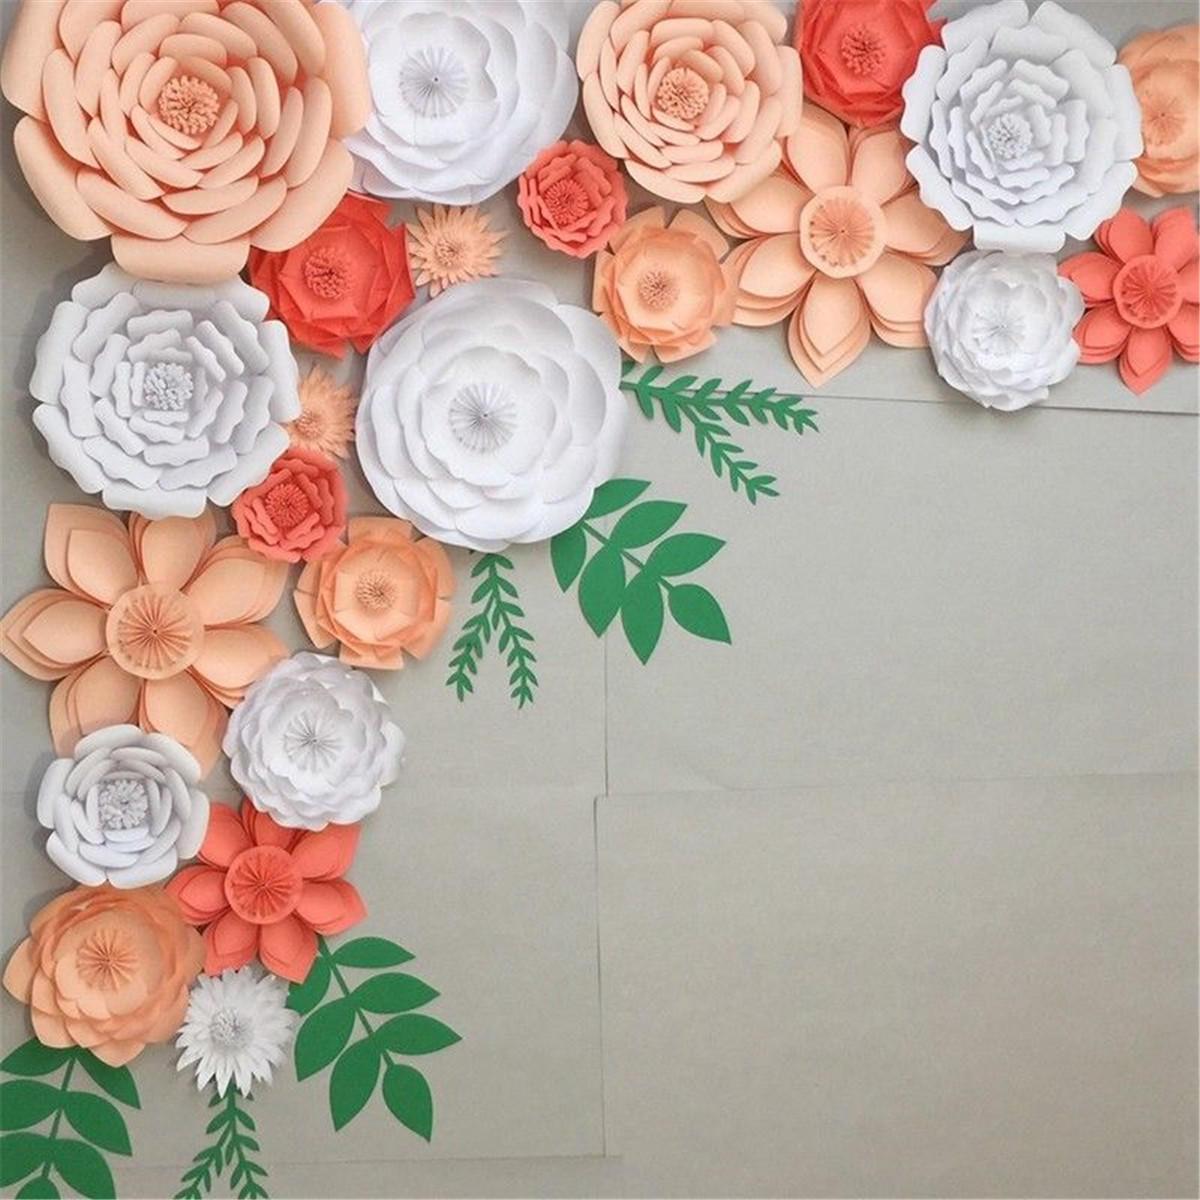 30cm DIY Paper Flowers Leaves Backdrop Decorations Kid Birthday Party Wedding Favor - Beige 1 COD